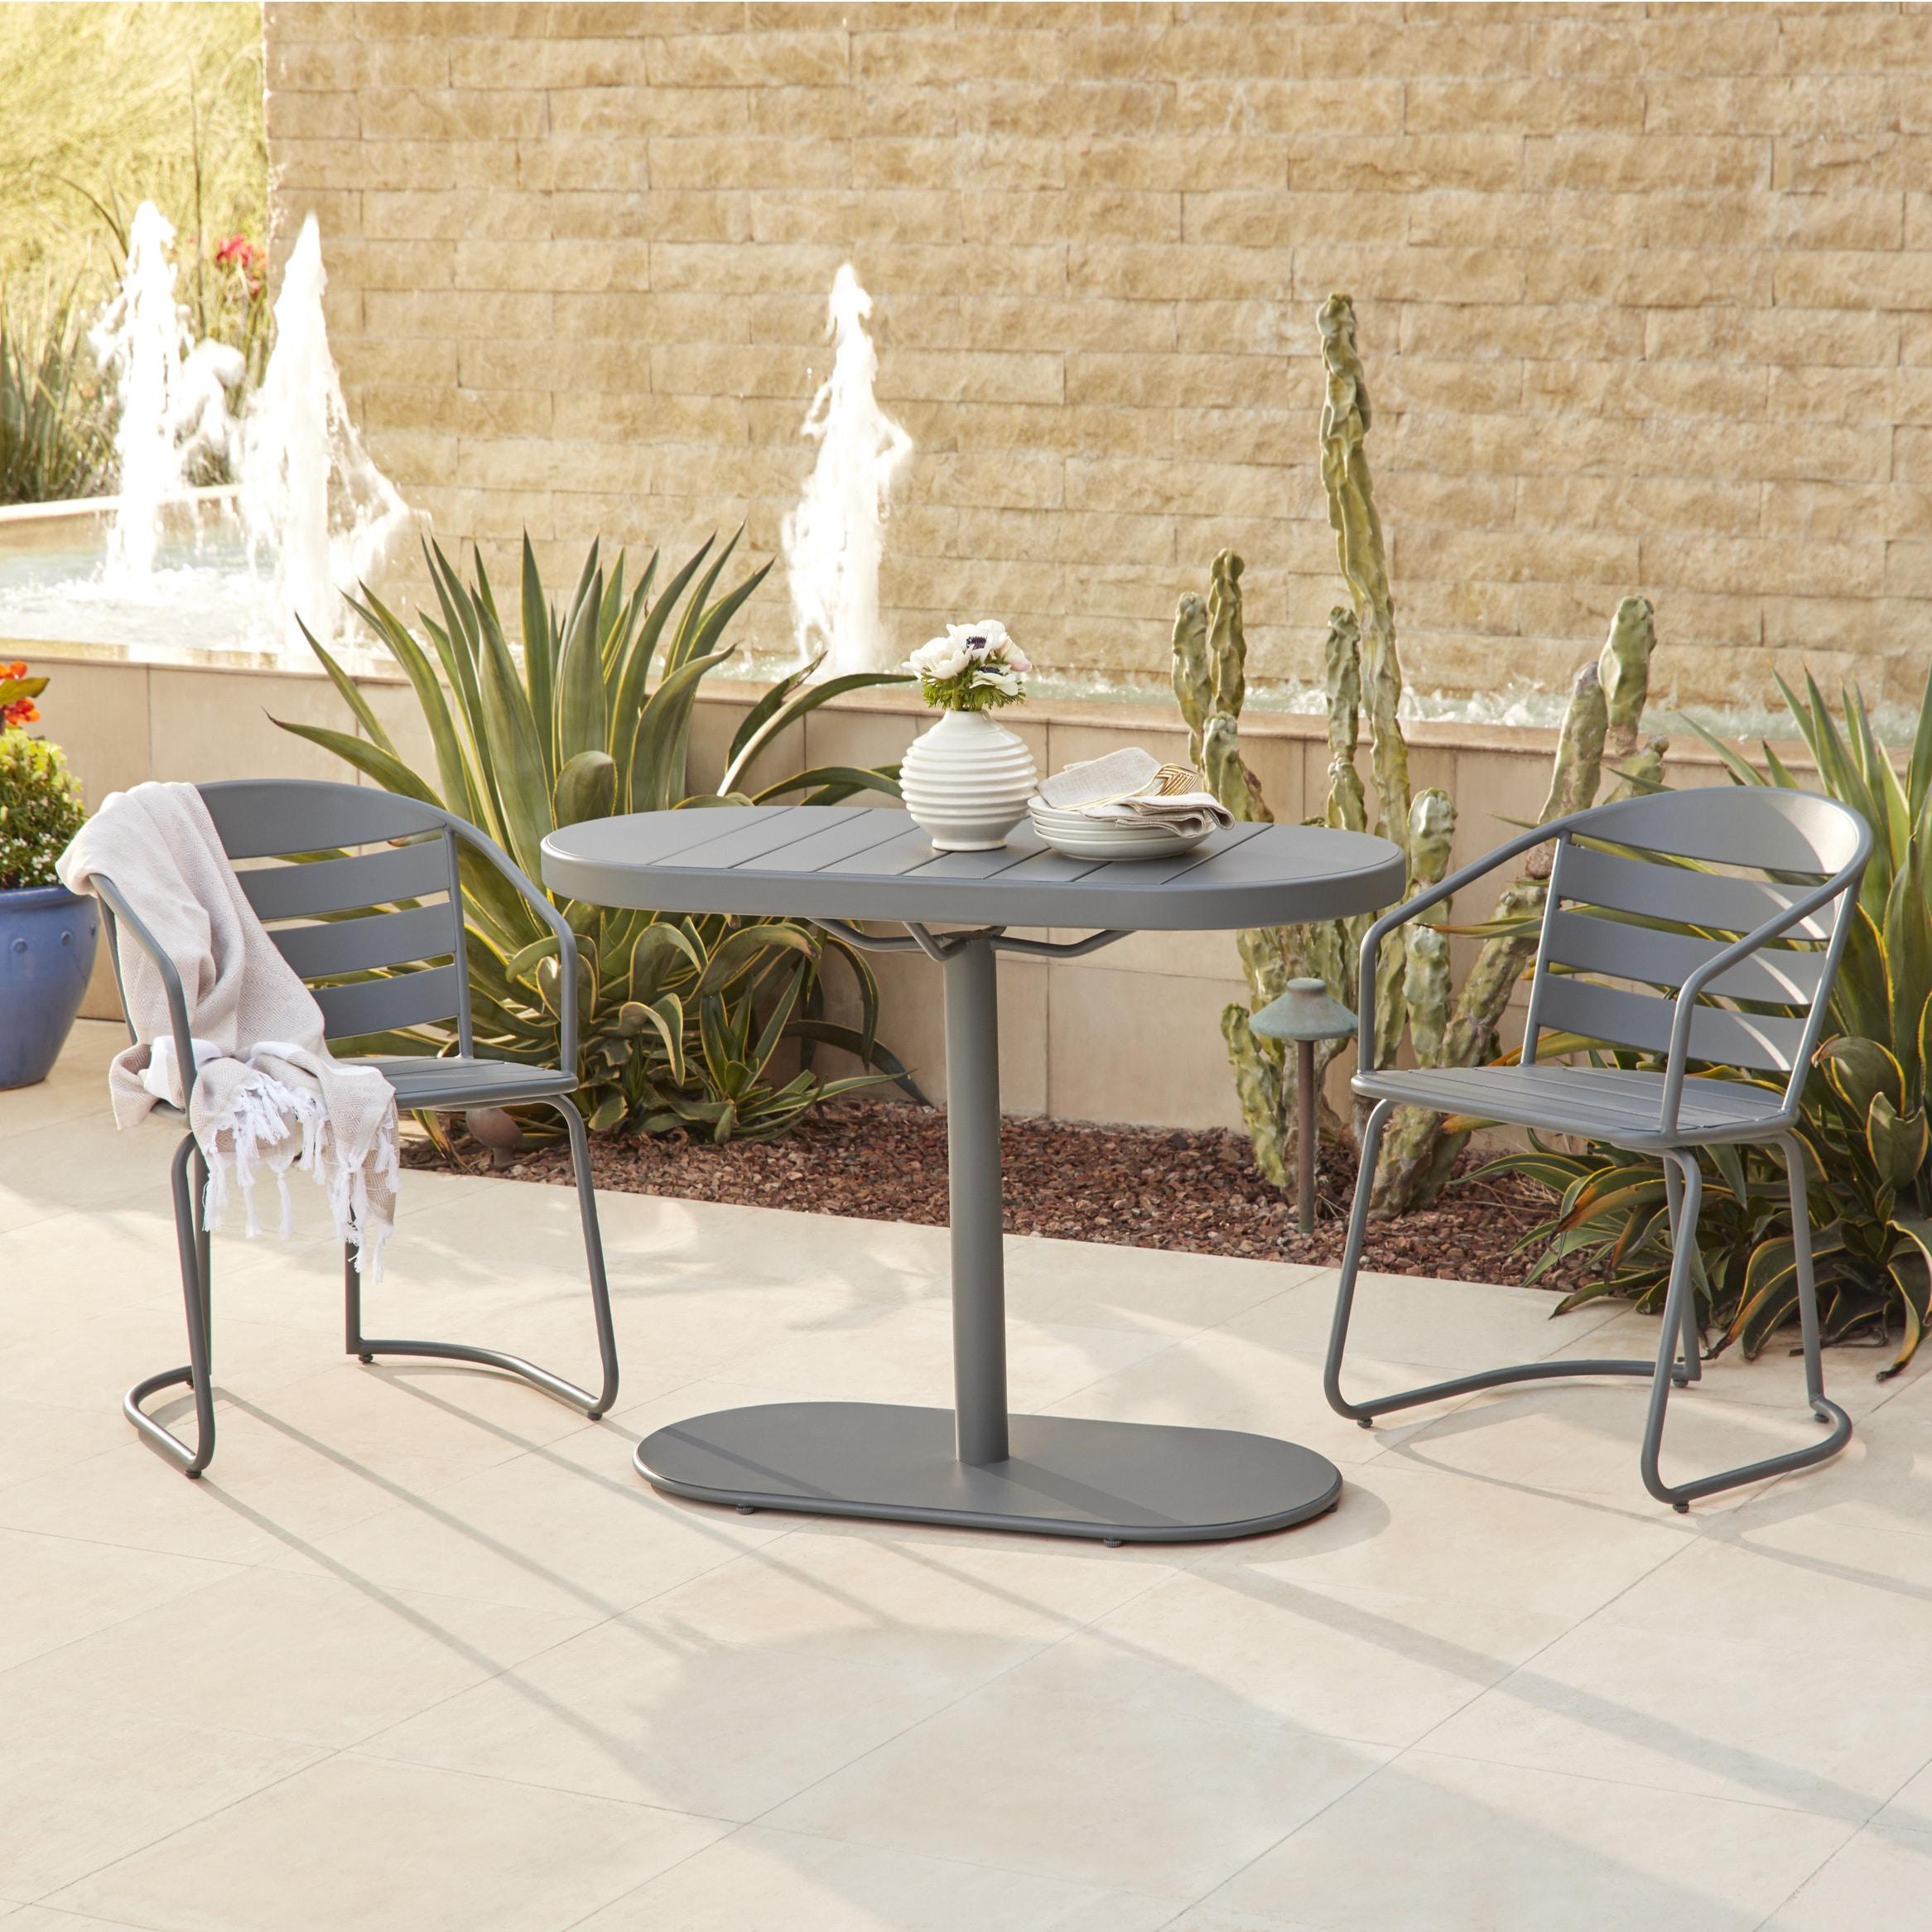 cosco grey outdoor steel nesting bistro patio set - Bistro Patio Set